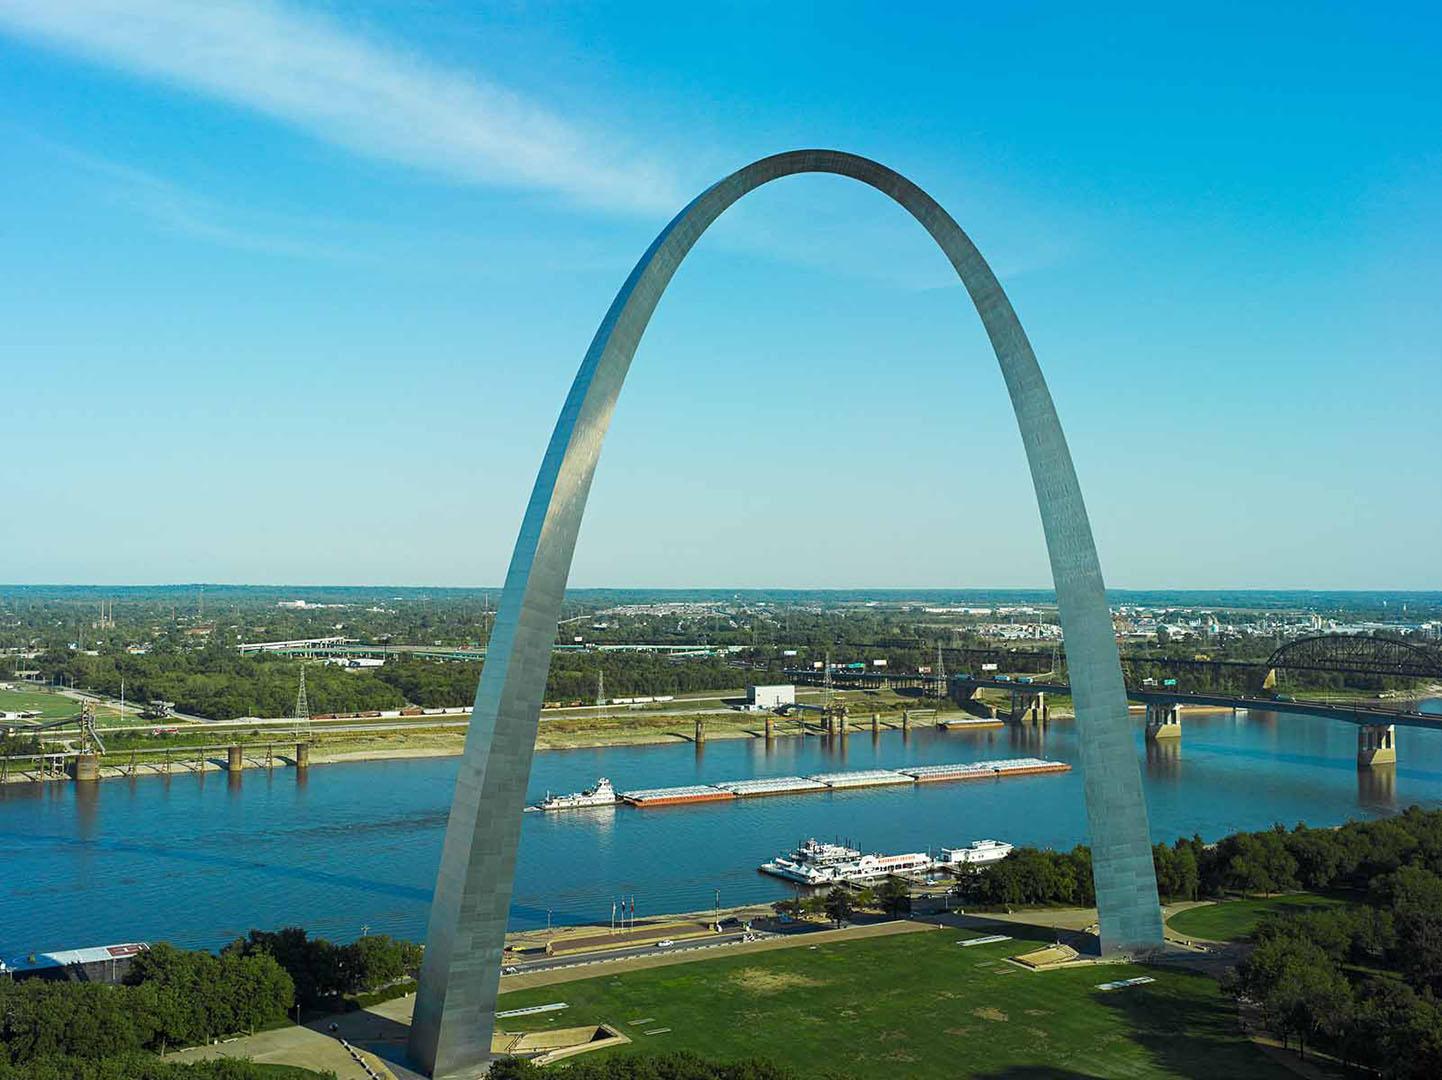 St_Louis_Arch_Barge_1442x1080